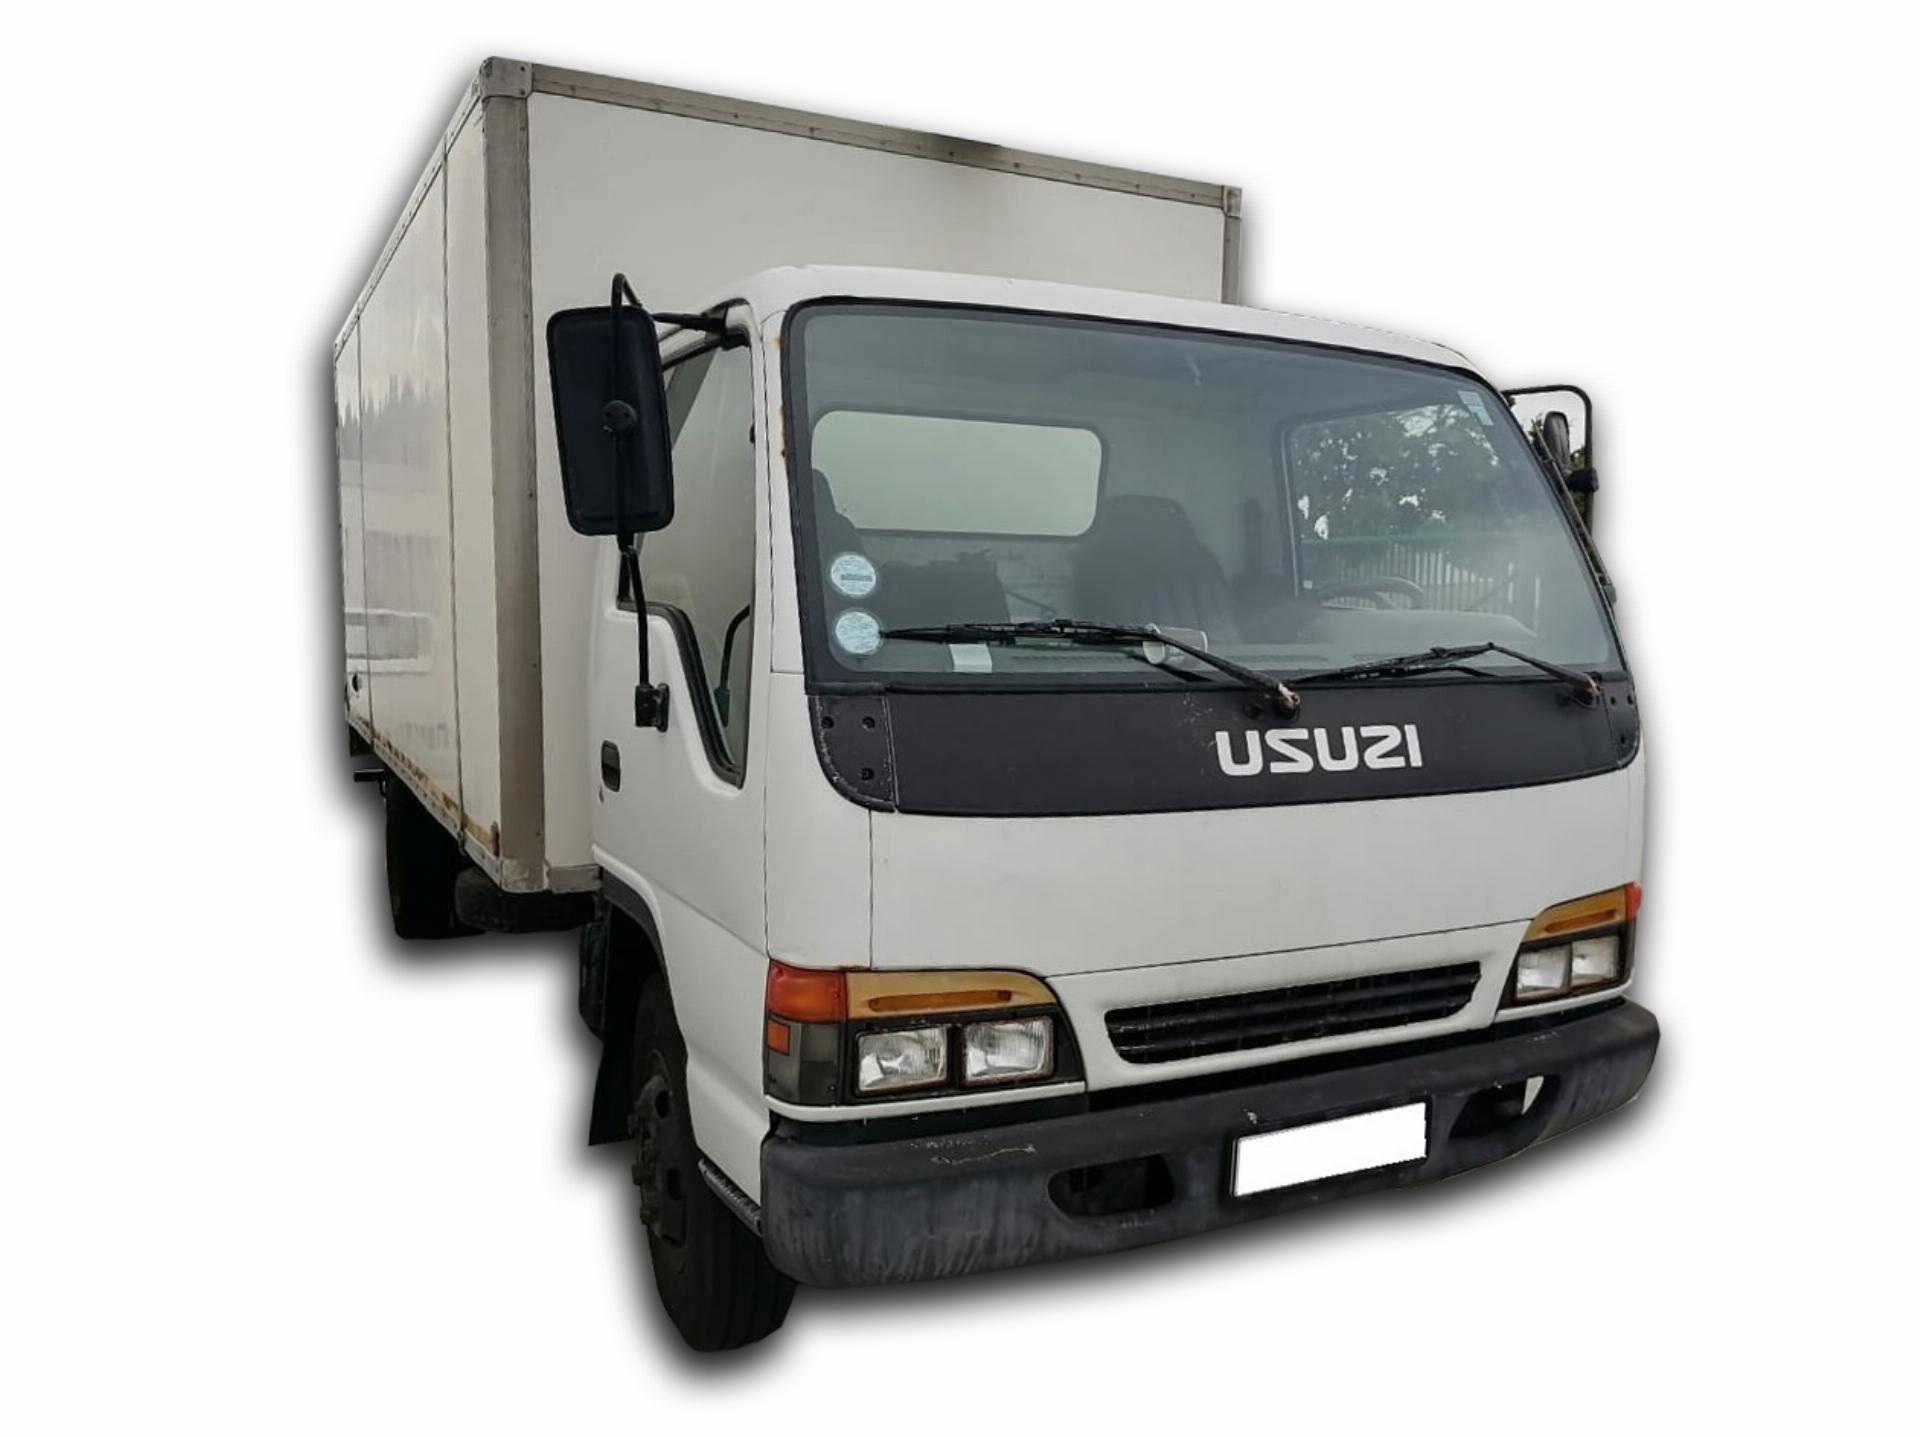 Isuzu N Series NQR 500 NQR500 Turbo